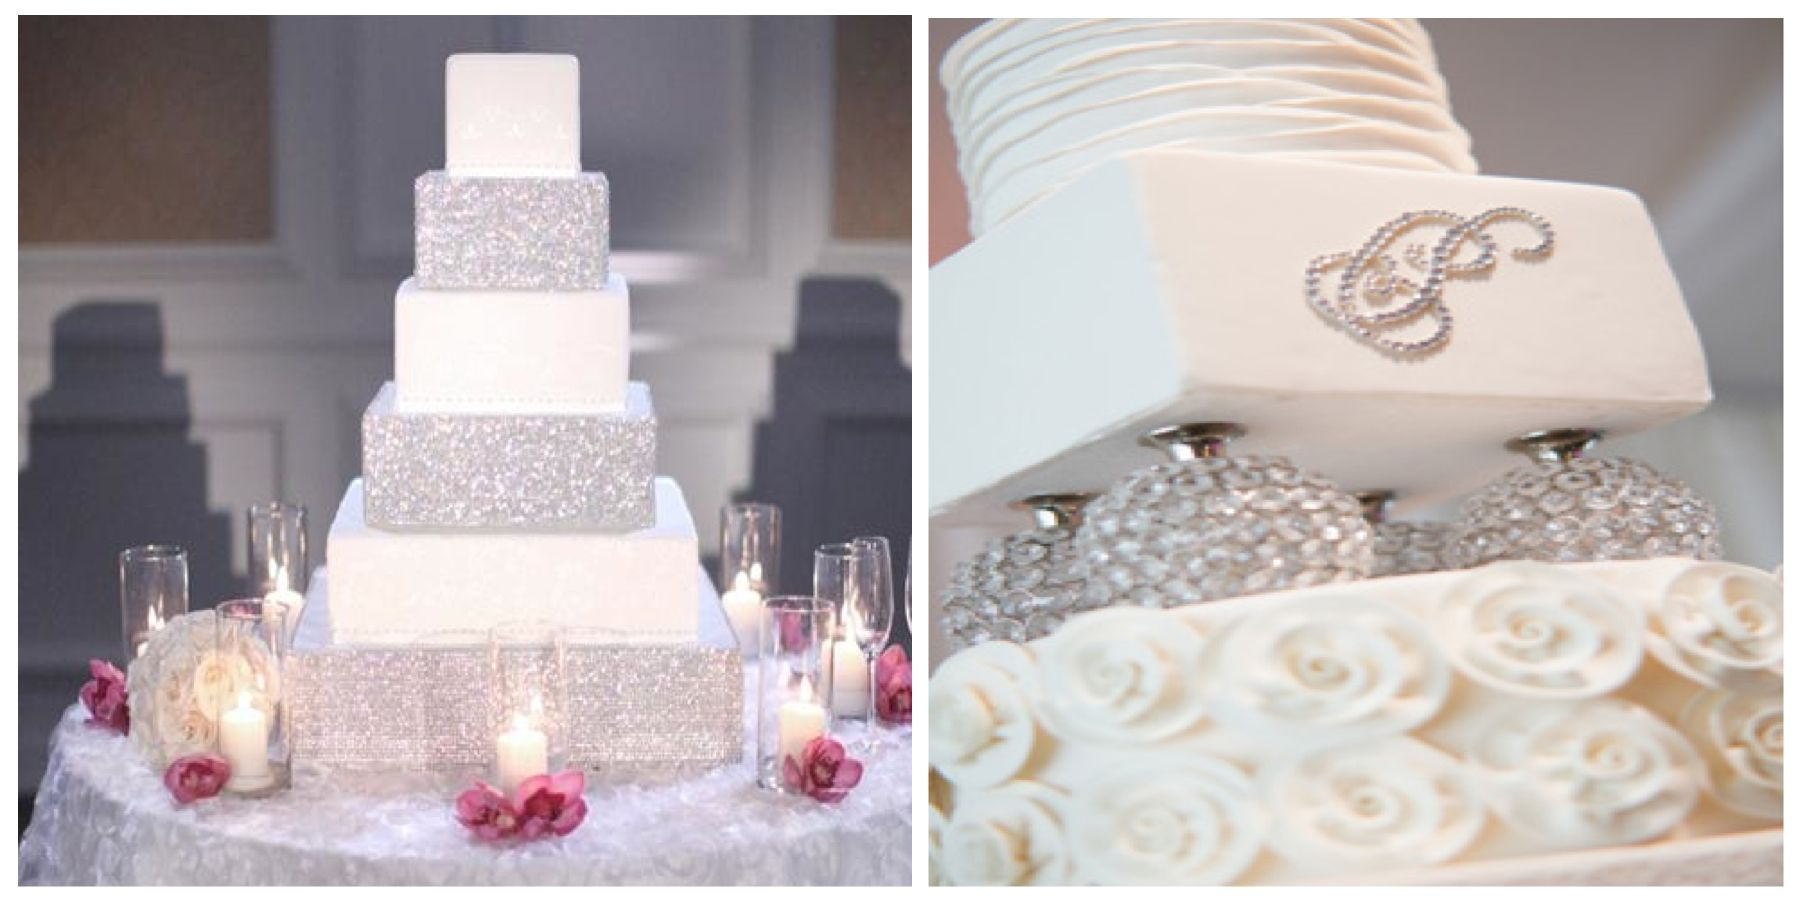 Cakes With Bling | Wedding cake, Cake and Sparkle wedding cakes